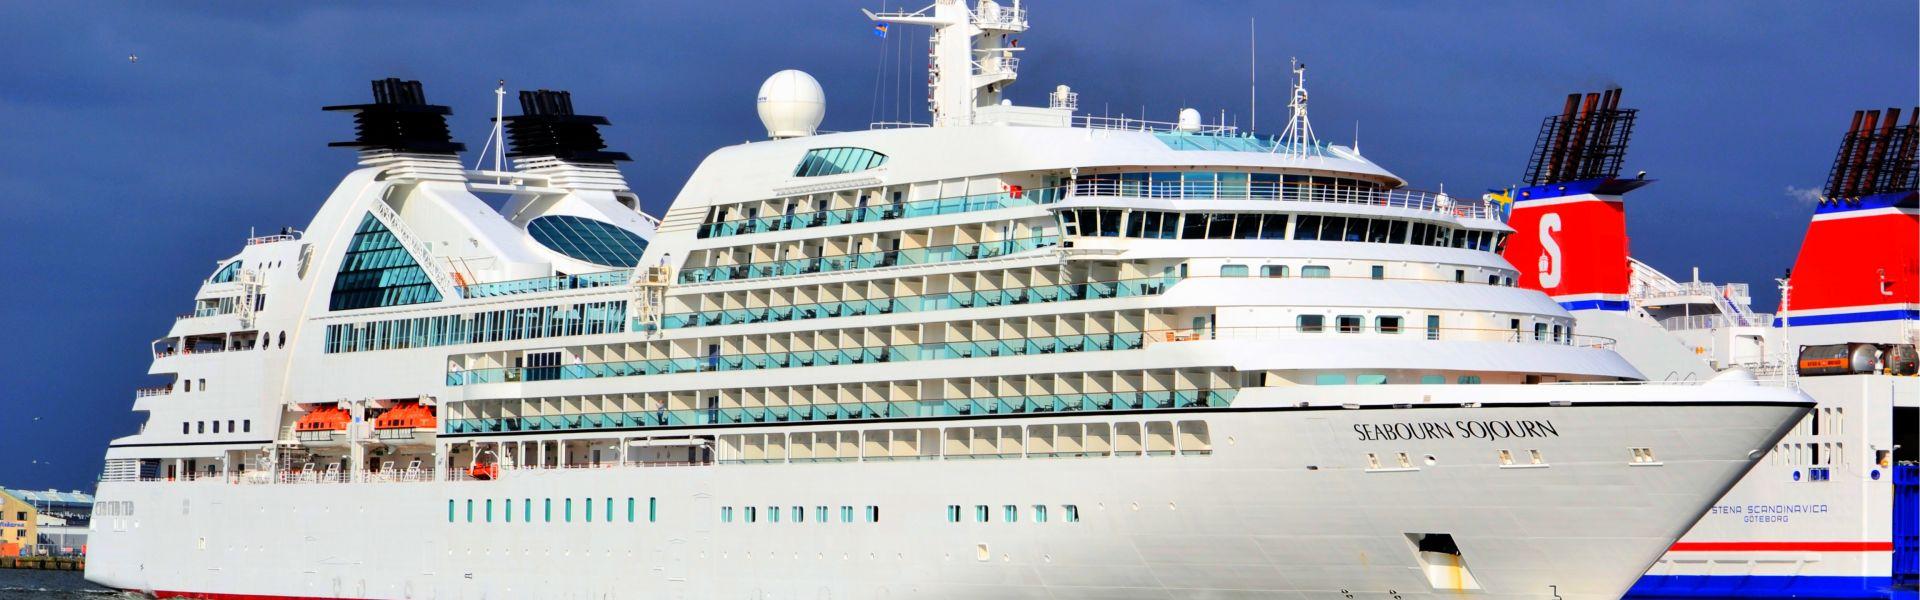 Croaziera 2017 - World & Exotic ( Papeete ) - Seabourn - Seabourn Sojourn - 20 nopti